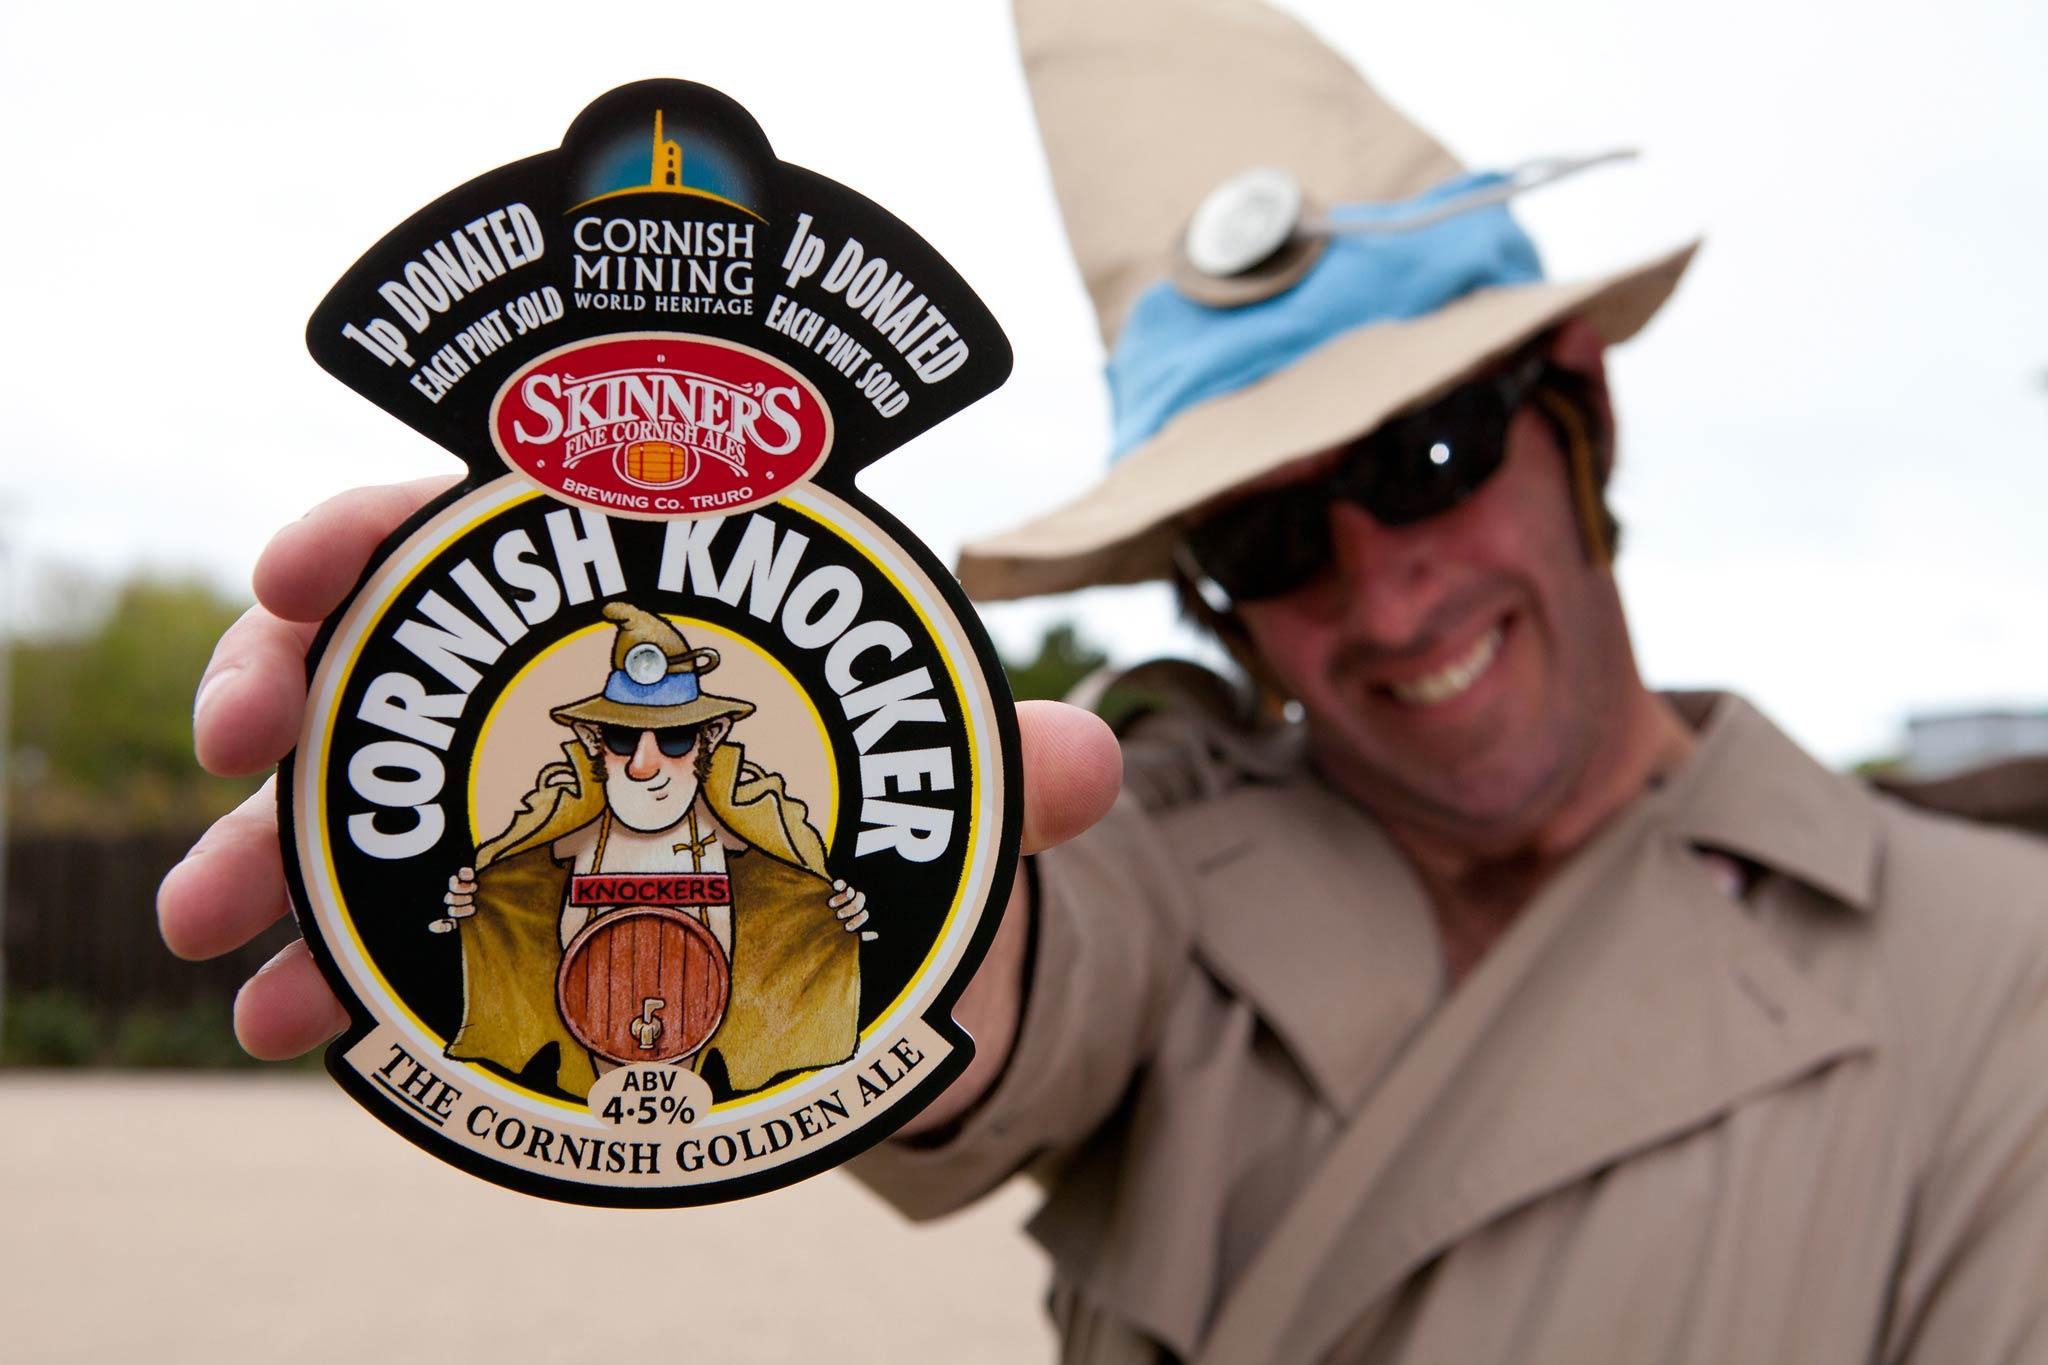 Skinners Brewery Cornwall